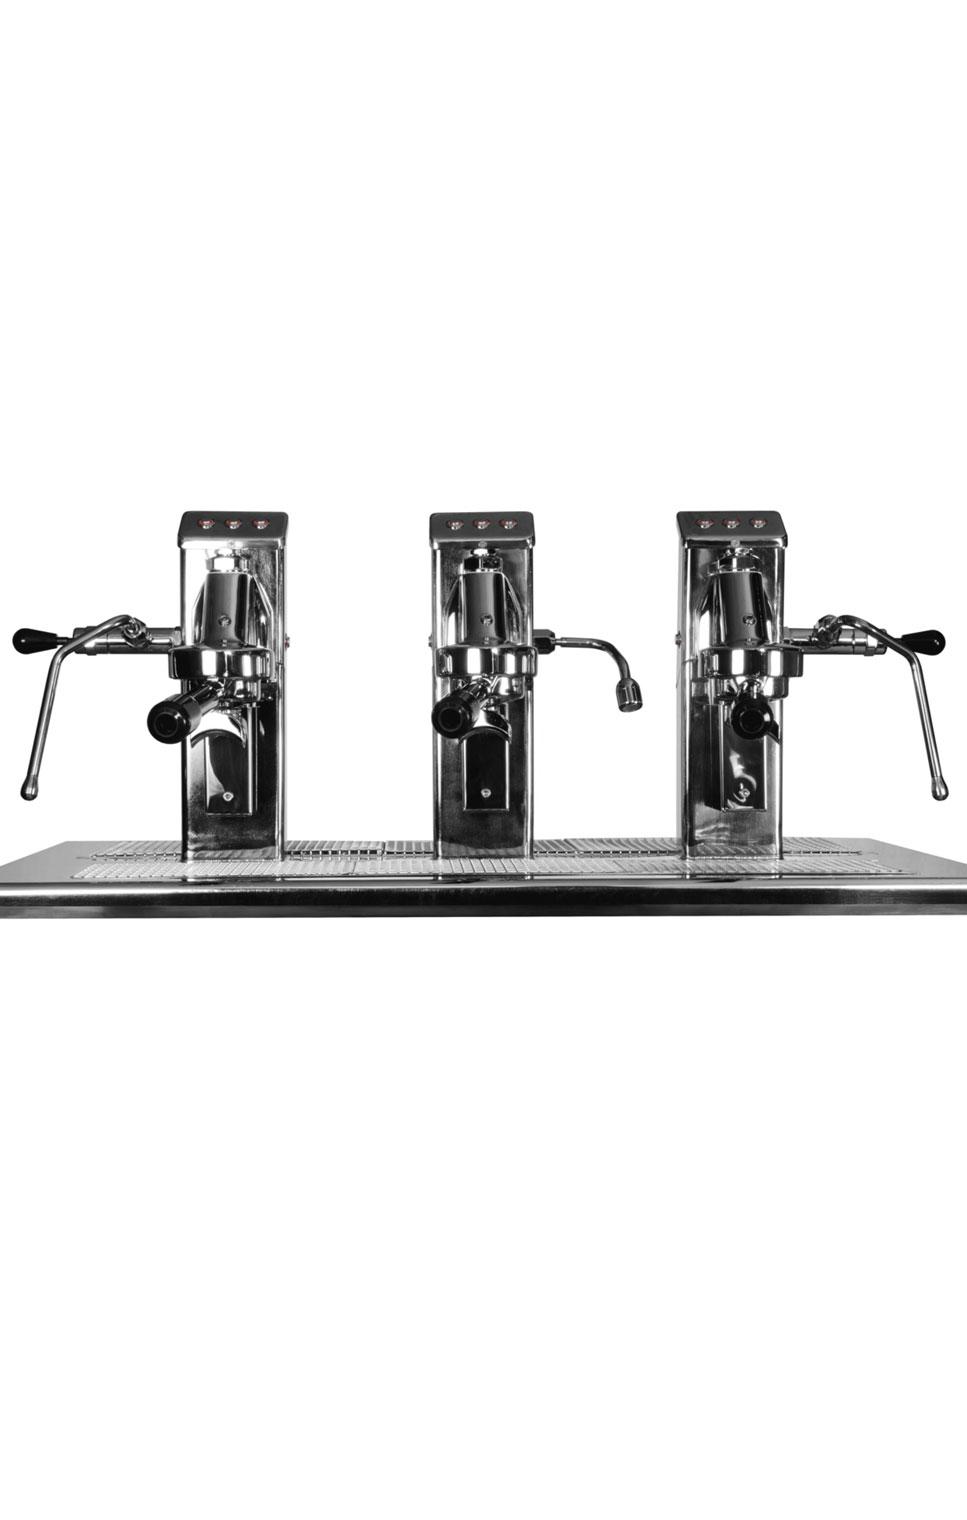 Commercial Espresso Coffee Machine espressoDECK 3 group front 2